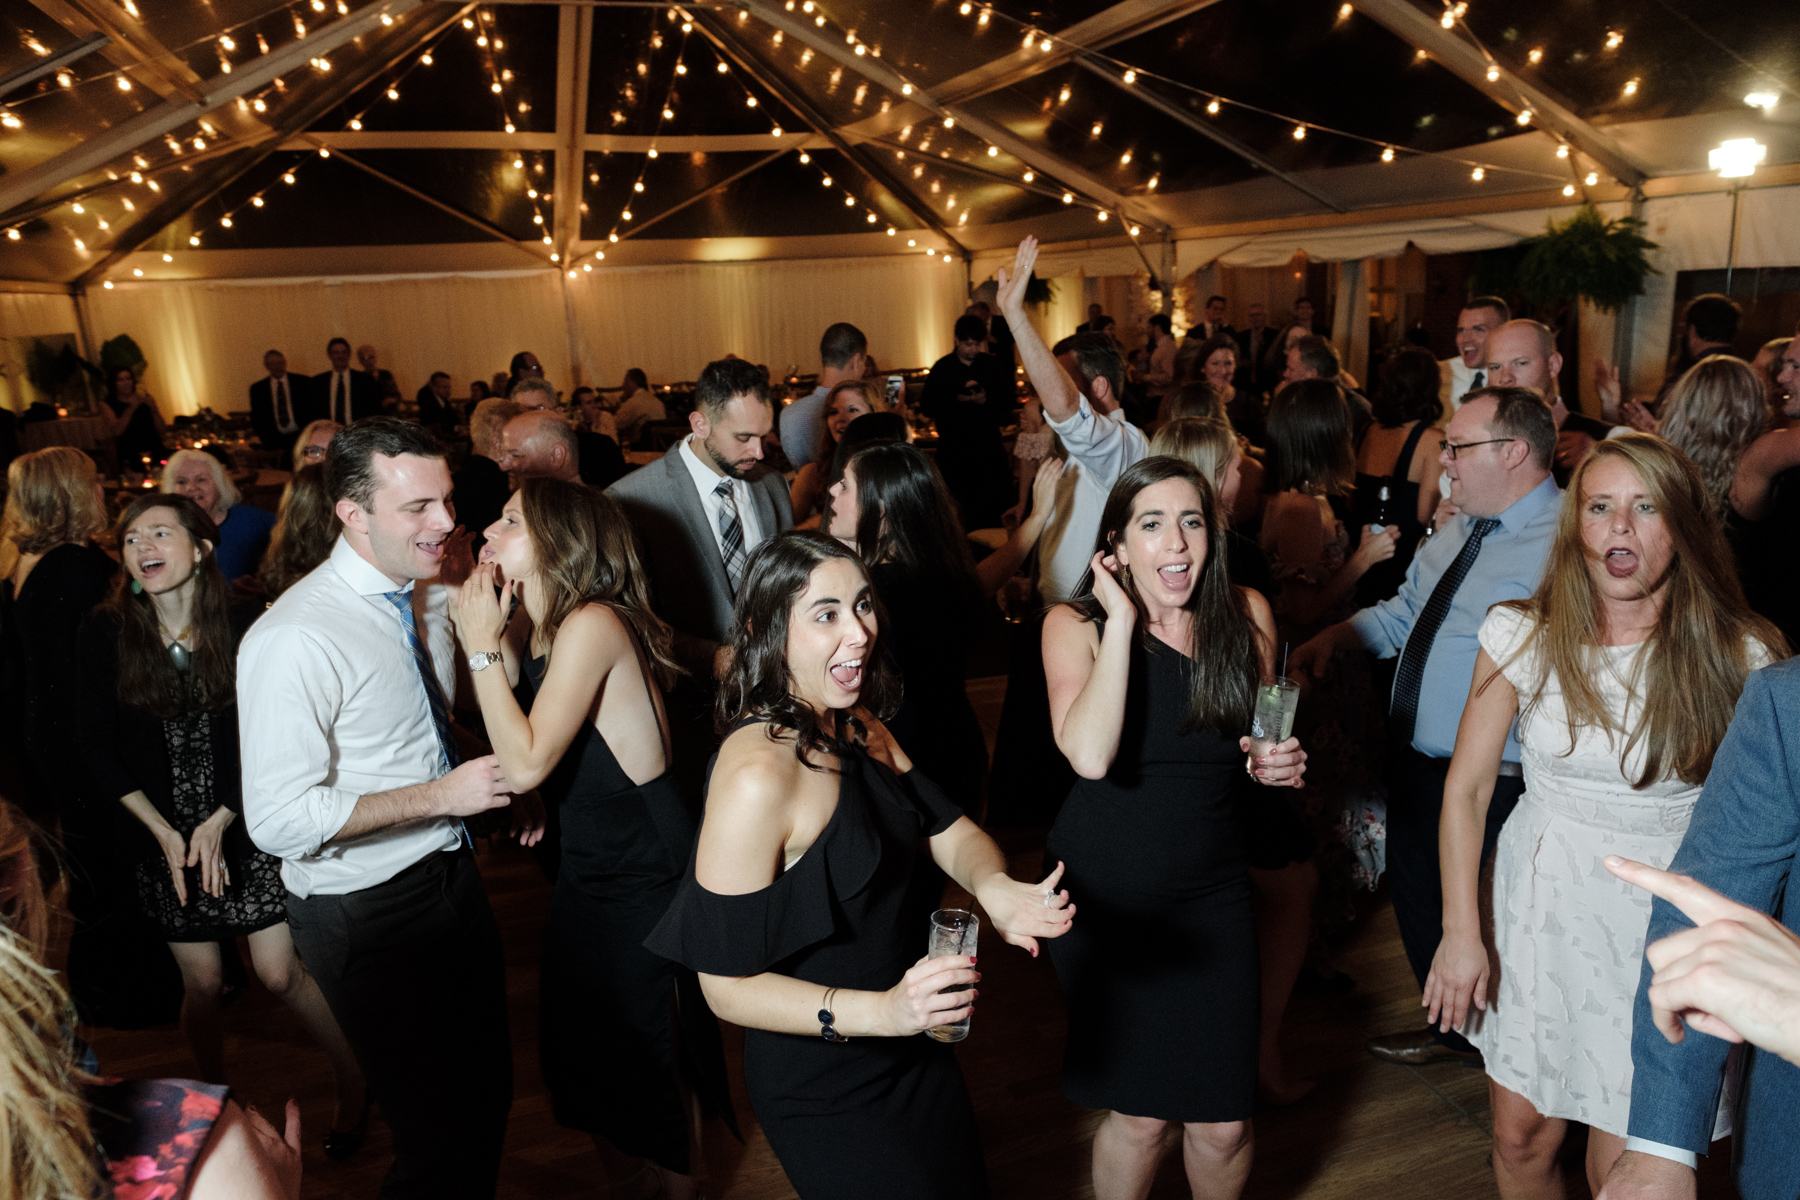 2017_BAP_KalliMatt_Gleneagles_CountryClub_Lemont_Wedding-95.jpg